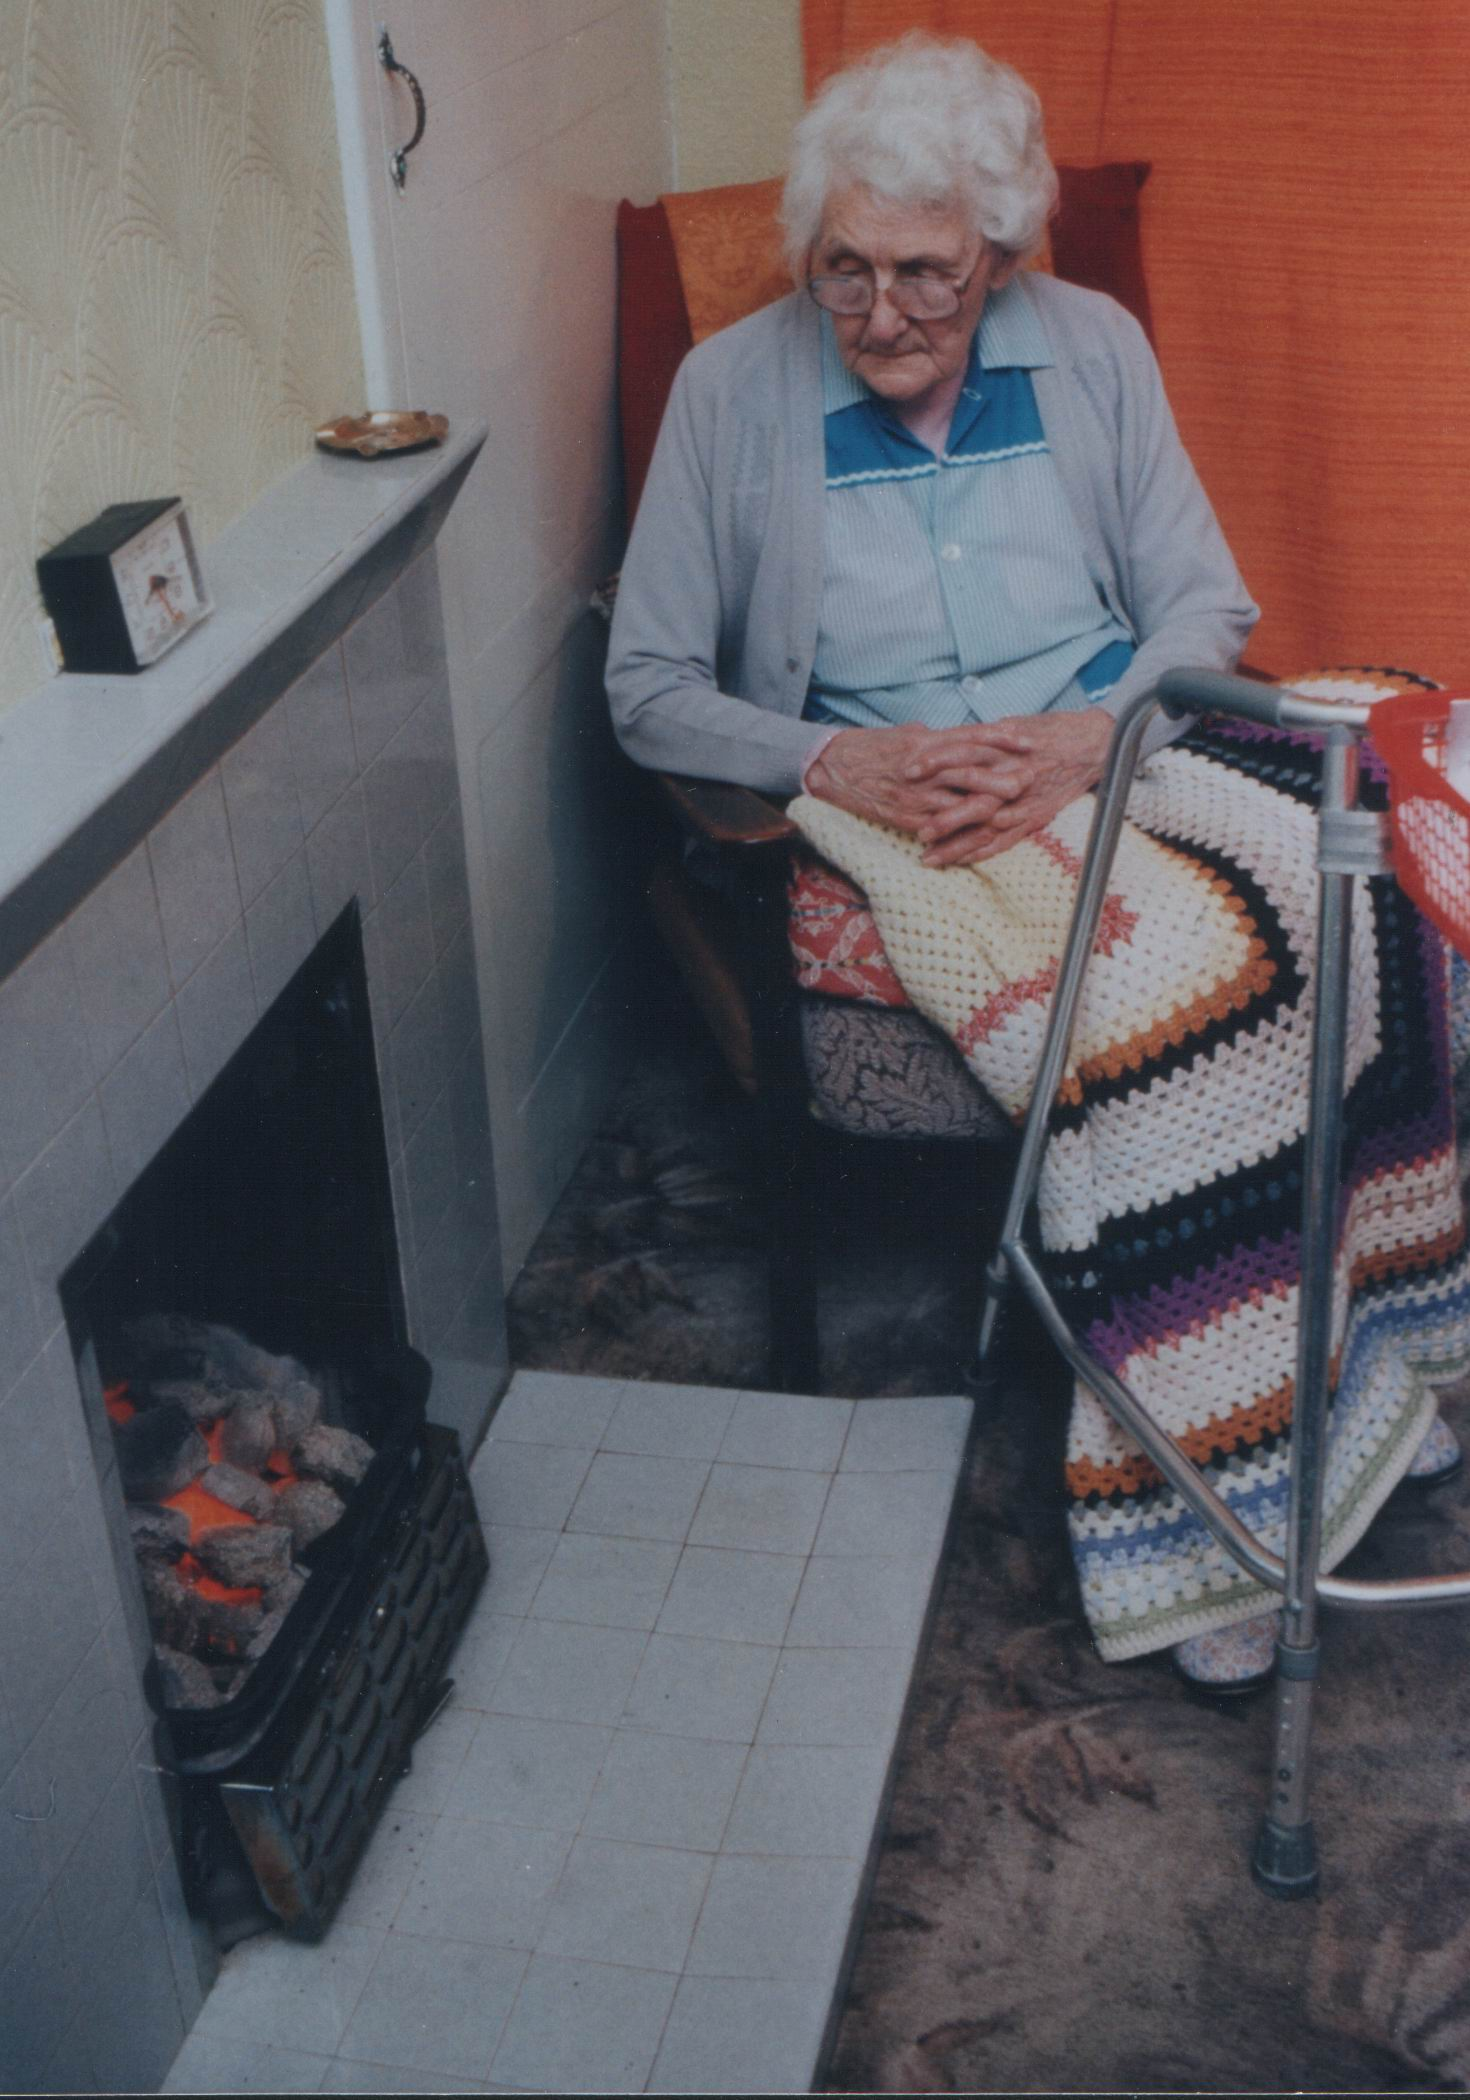 Elderly lady with blanket (credit NEA)